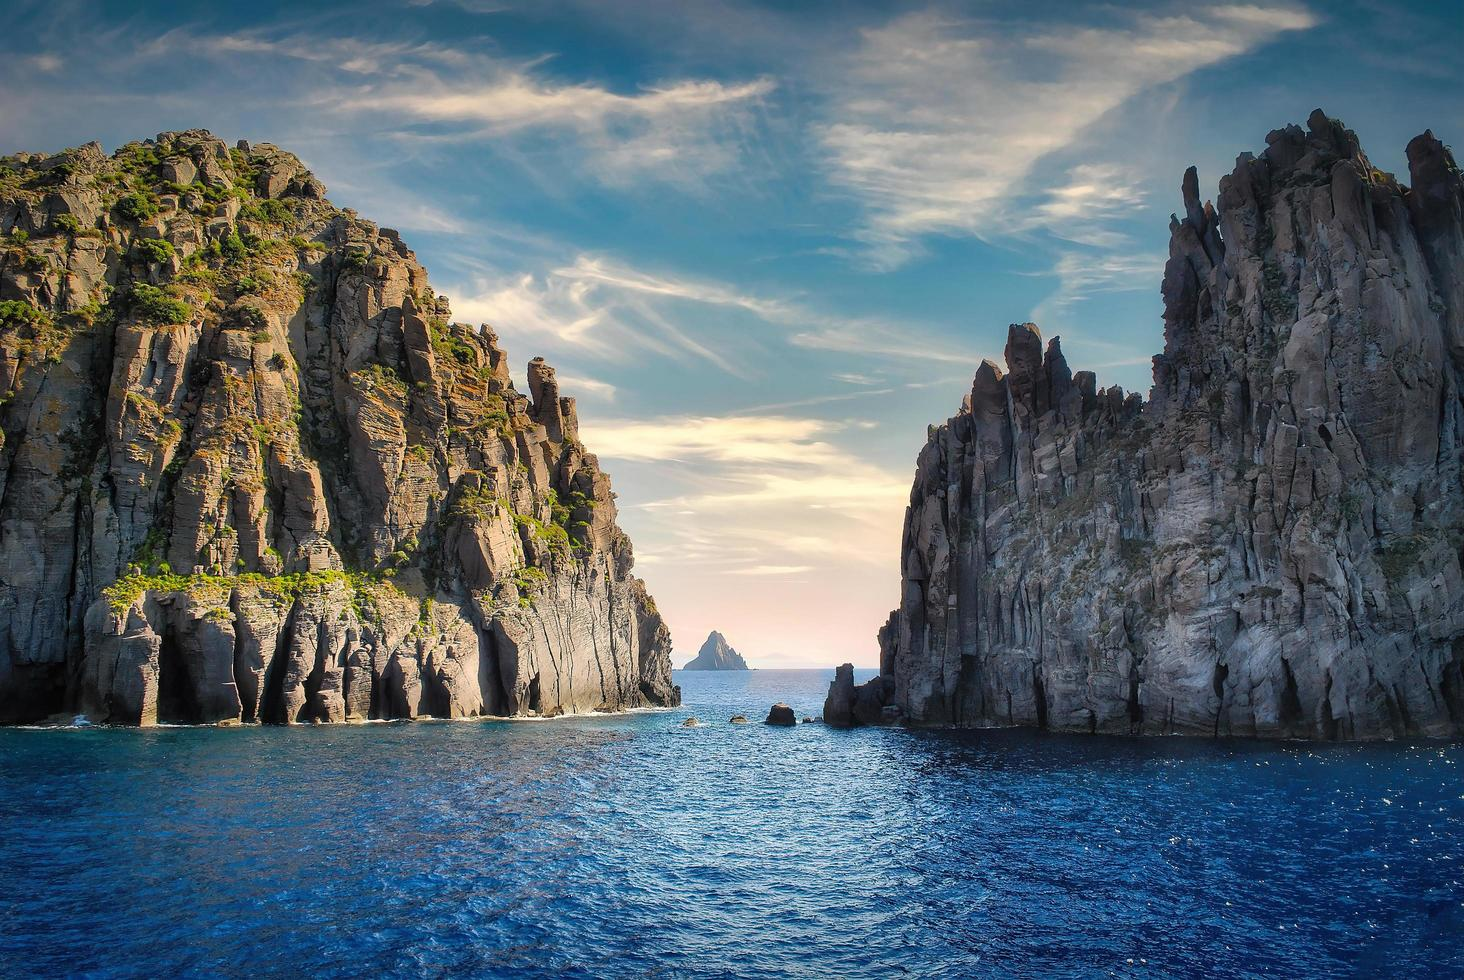 Stromboli Island in the Aeolian Islands photo